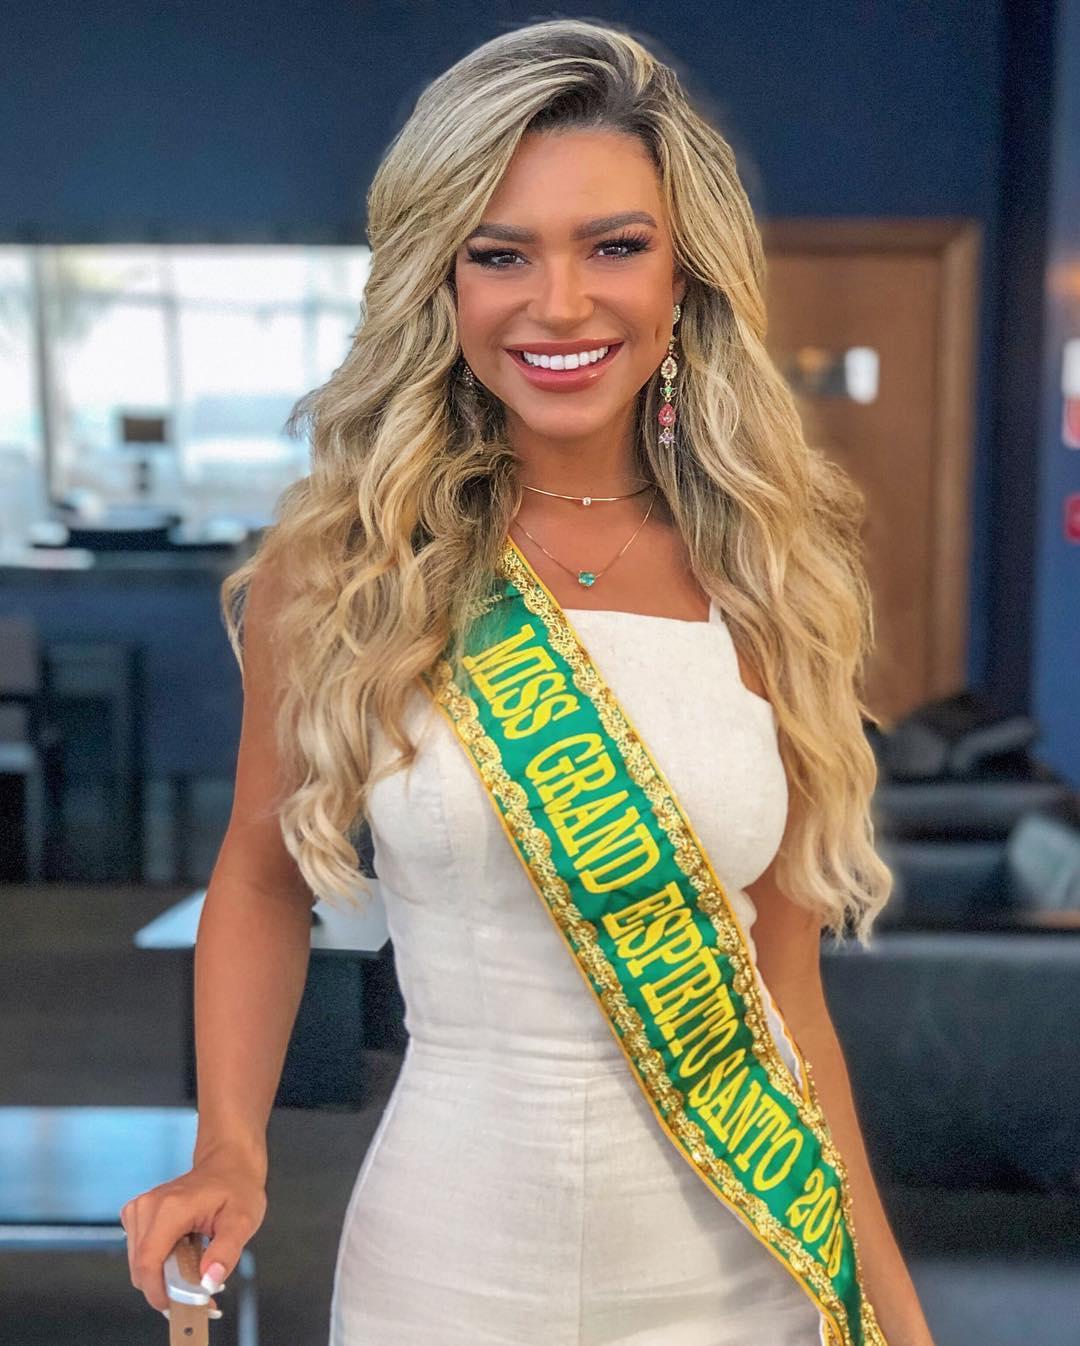 amanda cardoso, miss grand espirito santo 2019/3rd runner-up de miss intercontinental 2017. - Página 13 52087611